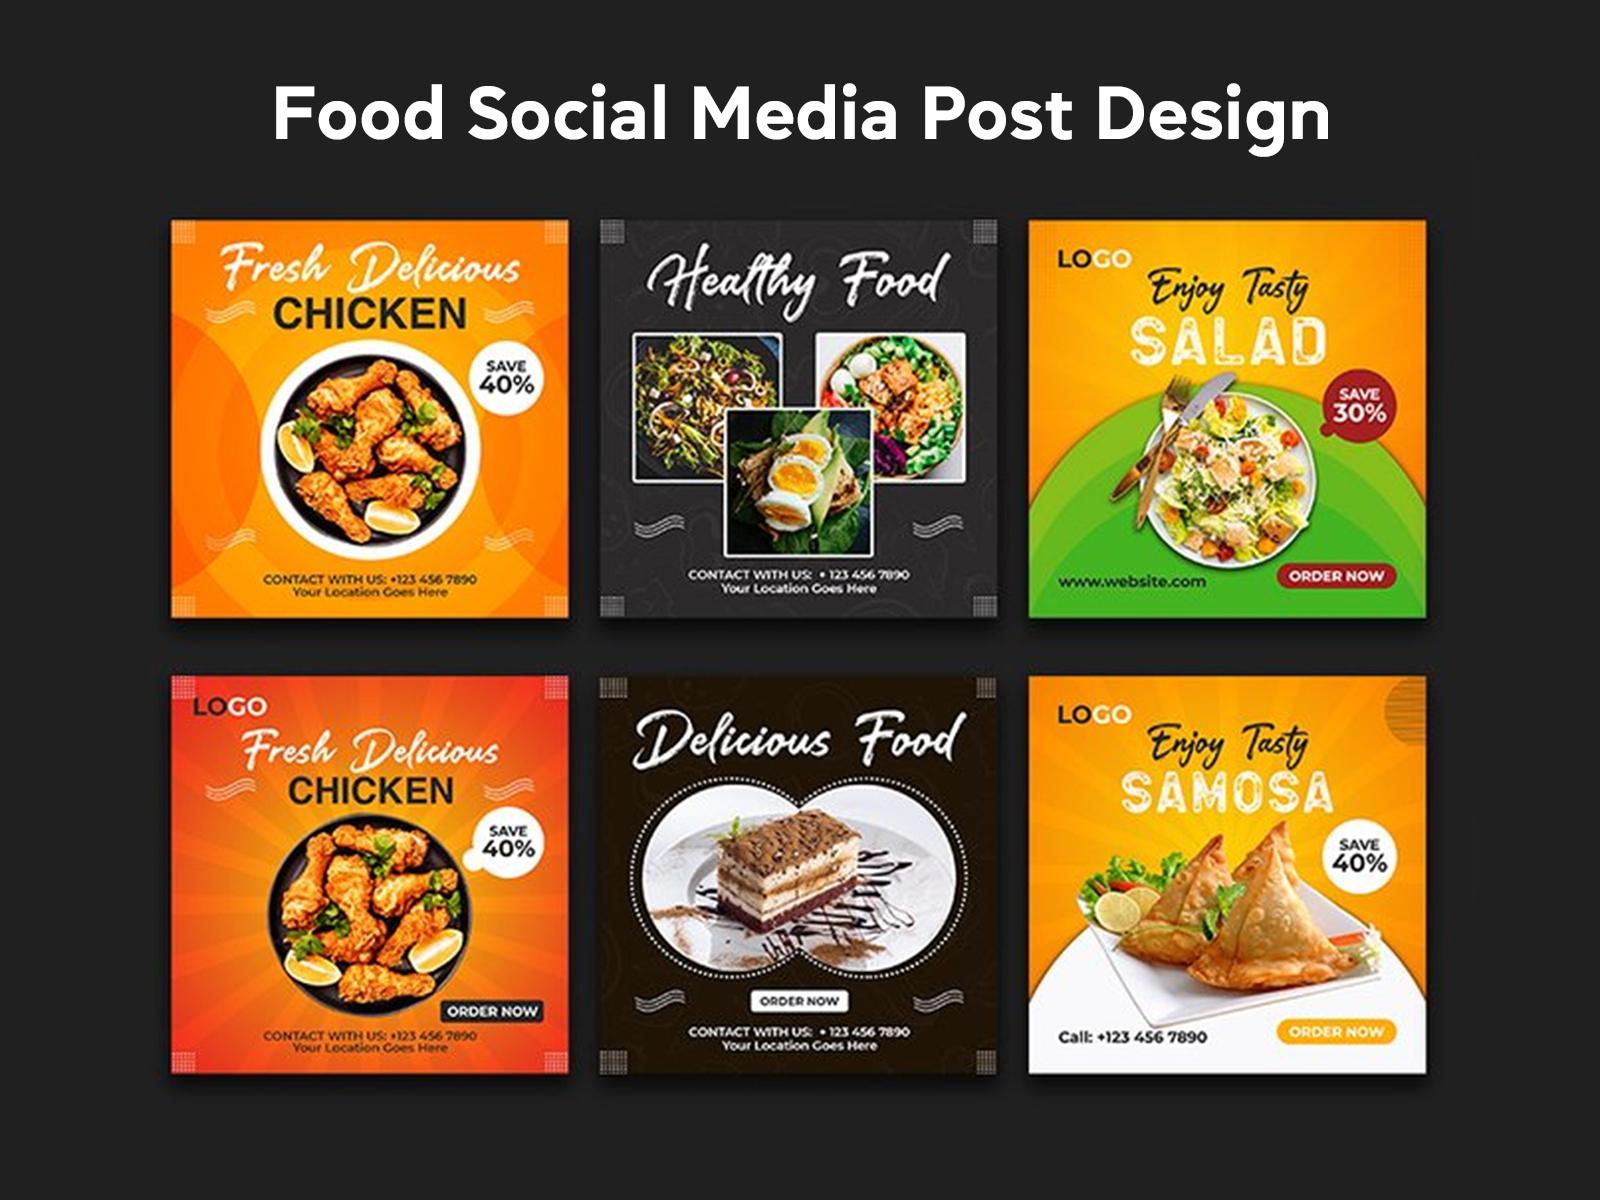 Food Restaurant Social Media Post Design Template By Md Al Mamun On Dribbble